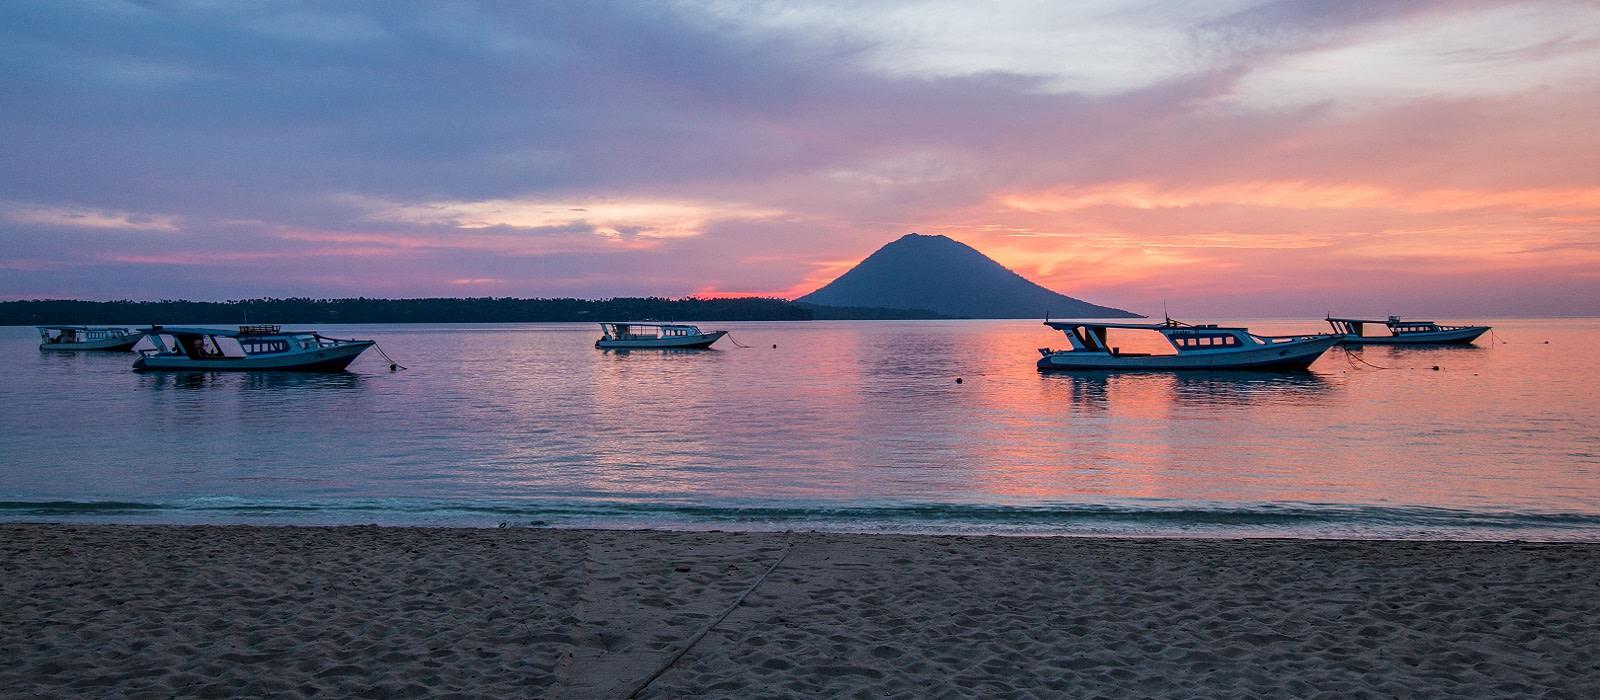 Reiseziel Sulawesi, Bunaken National Park Indonesien